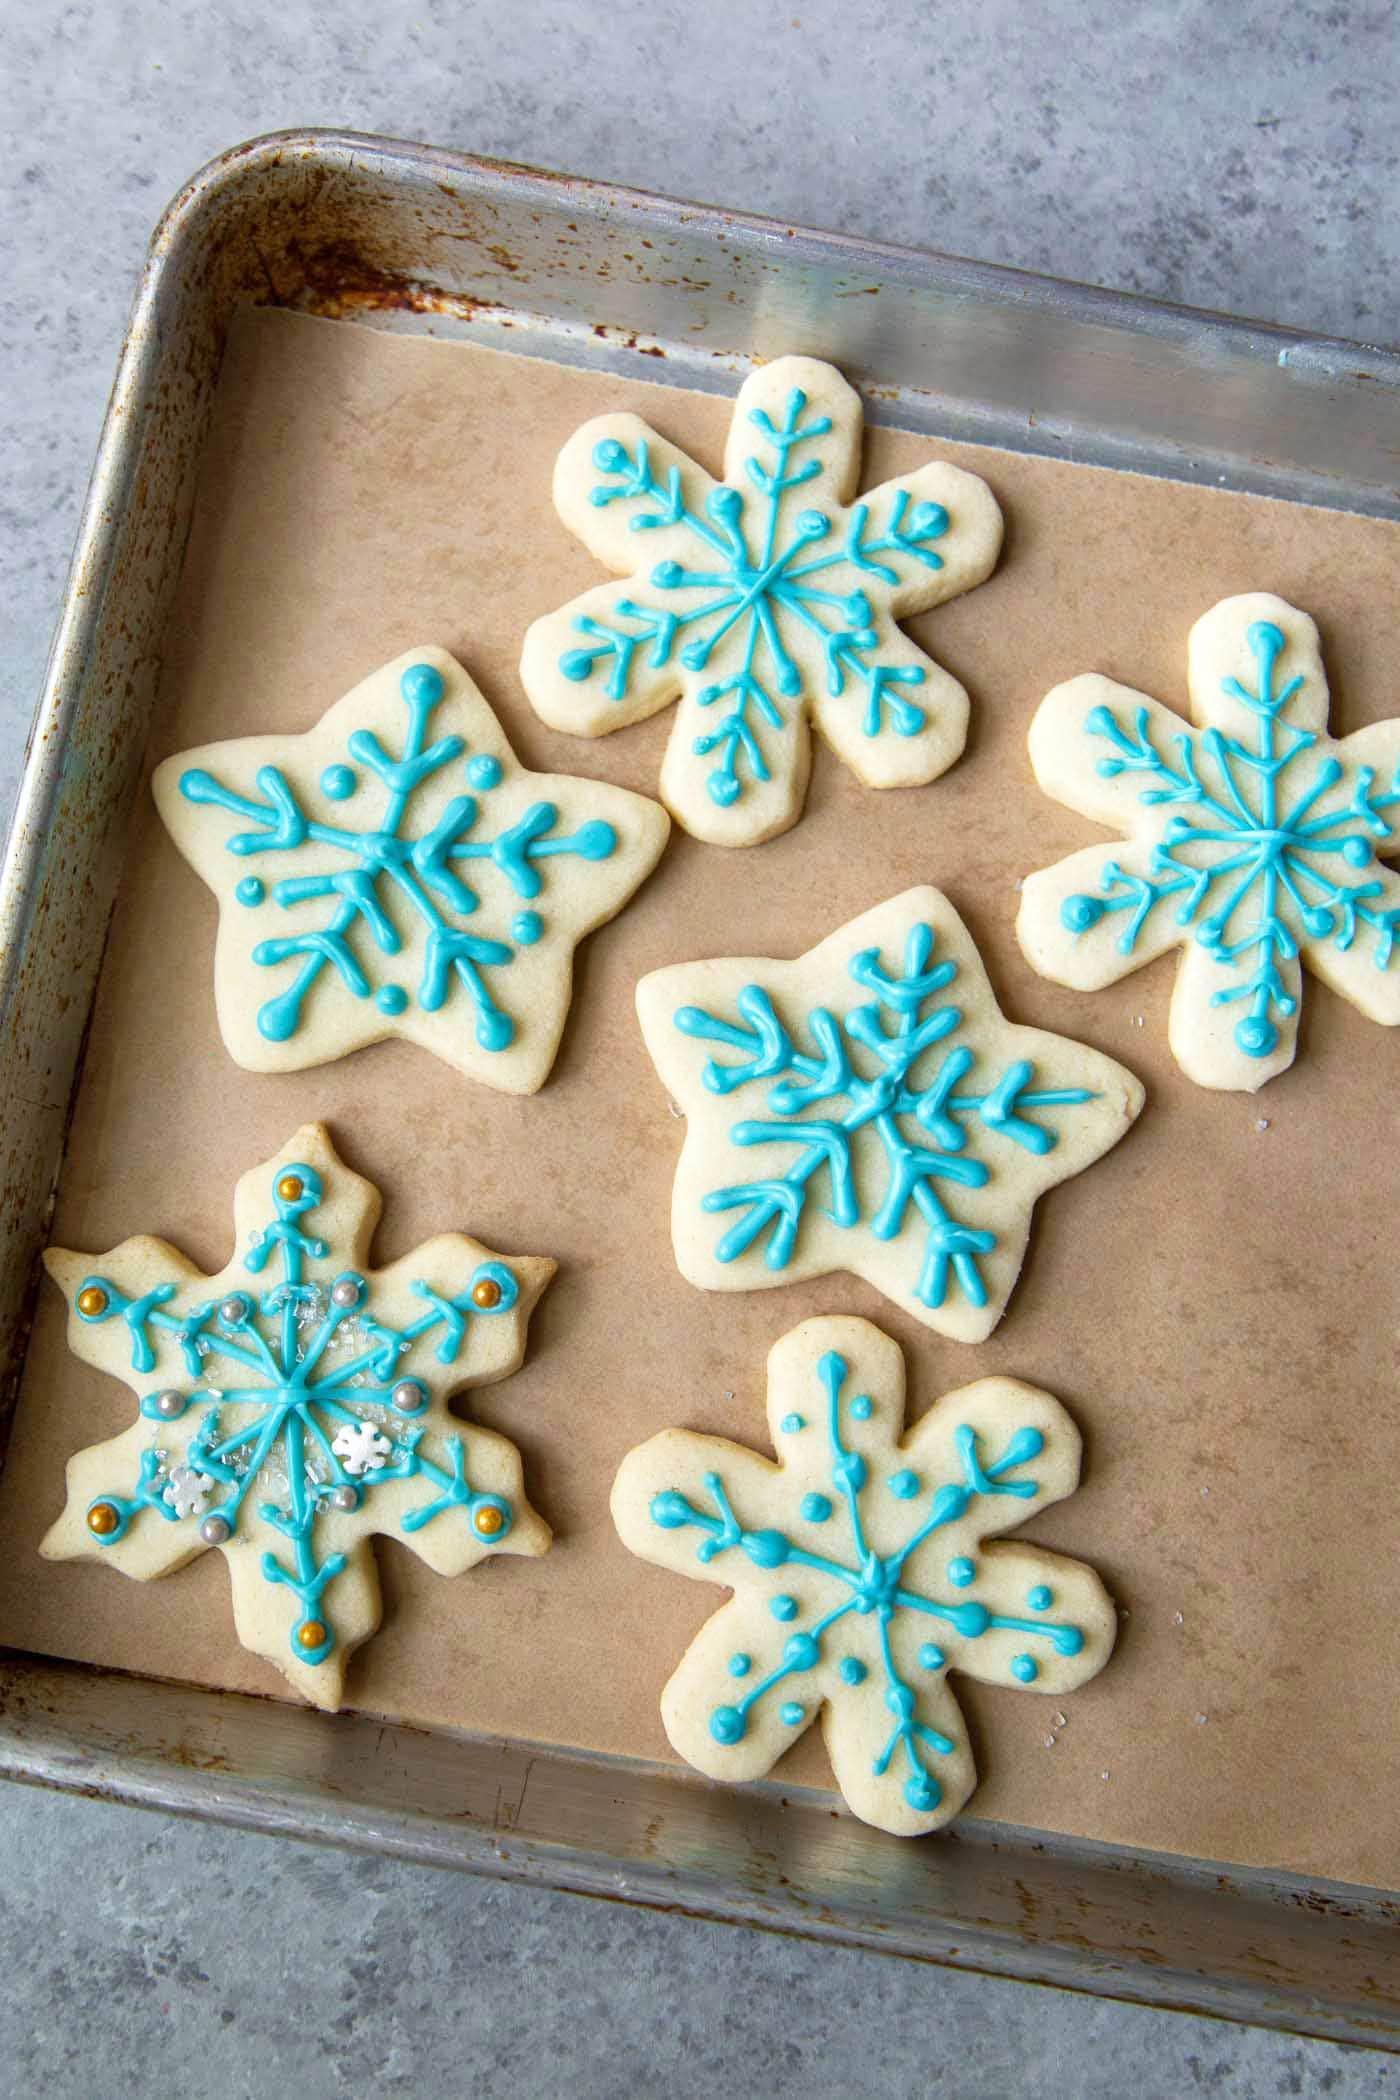 Candy Melt Sugar Cookies